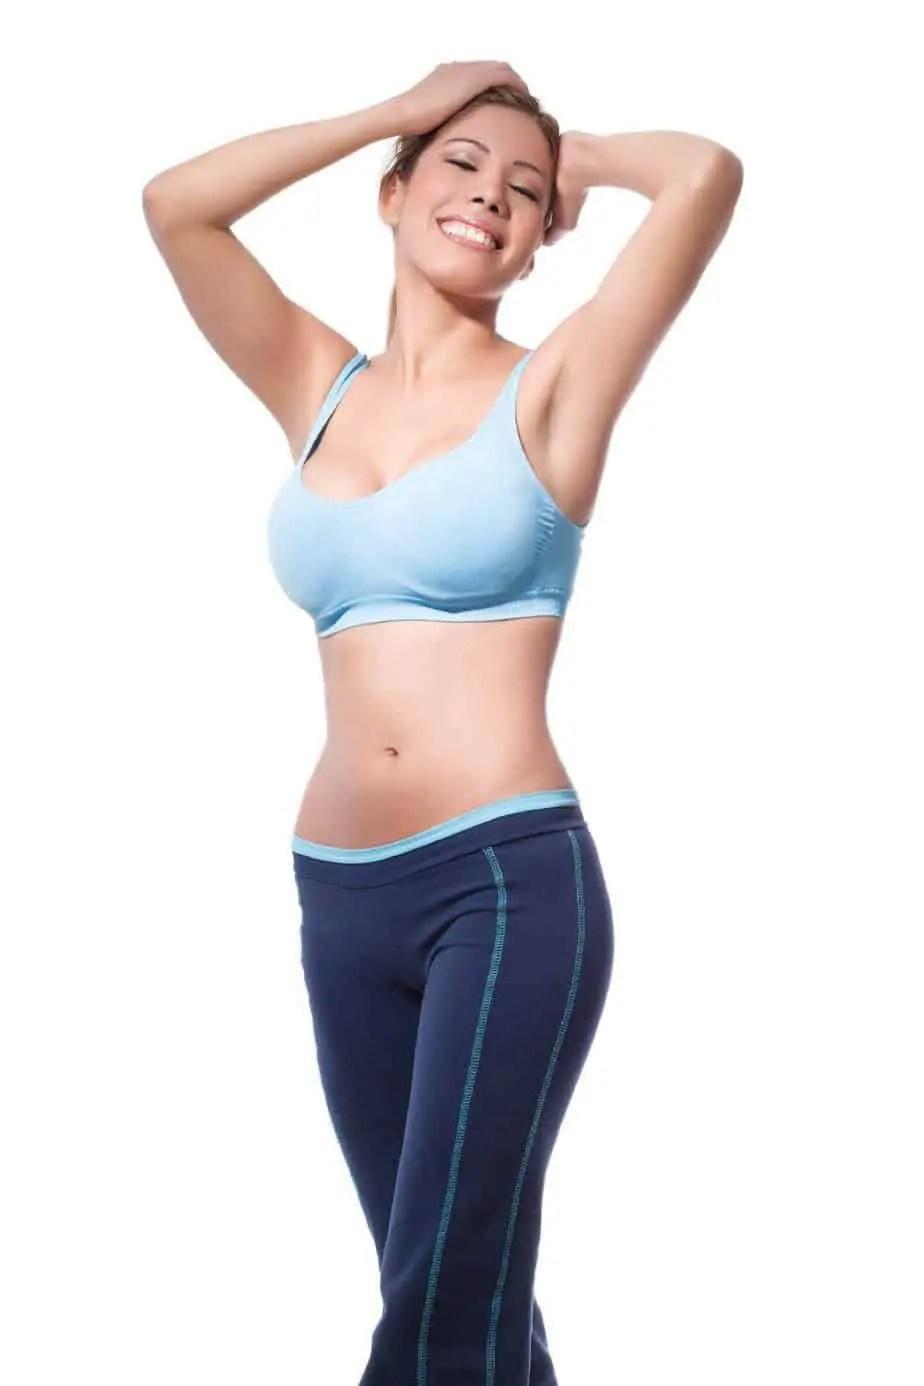 VASER LIPOSCULPTURE | BODY SCULPTING | Arm Lift | Arm Rejuvenation